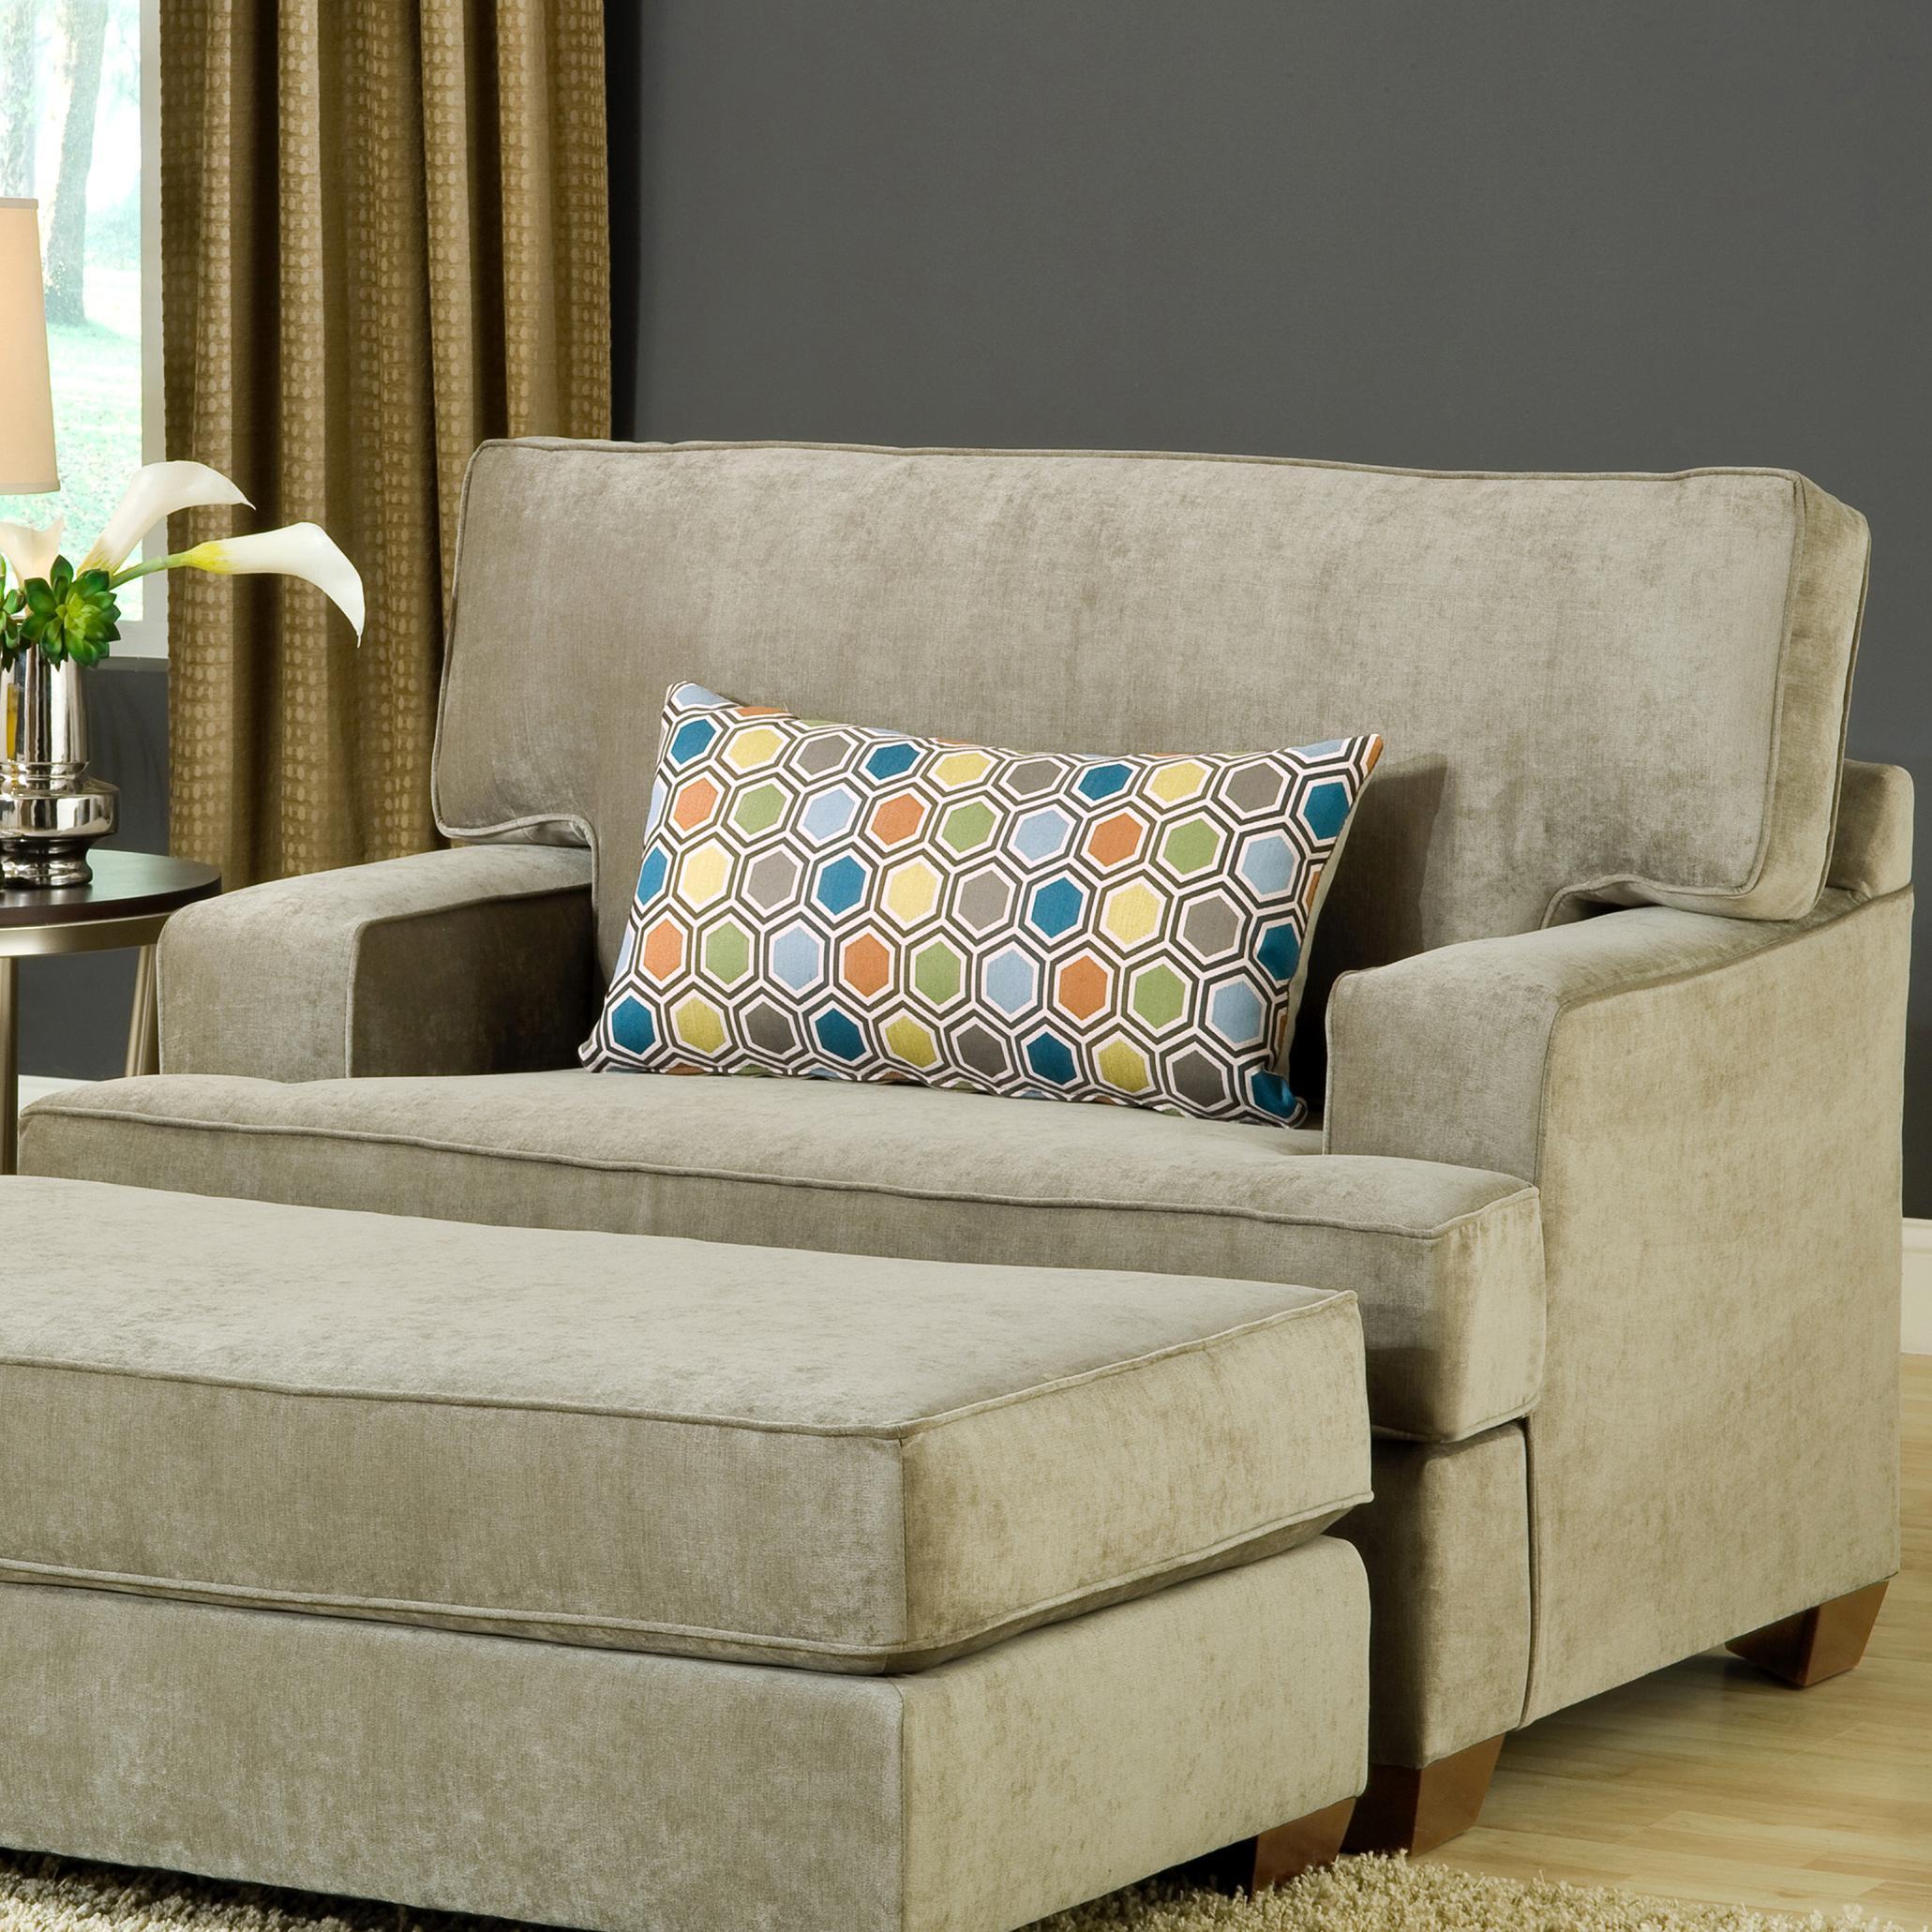 Belfort Essentials Daniel Upholstered Chair - Item Number: 5900-10